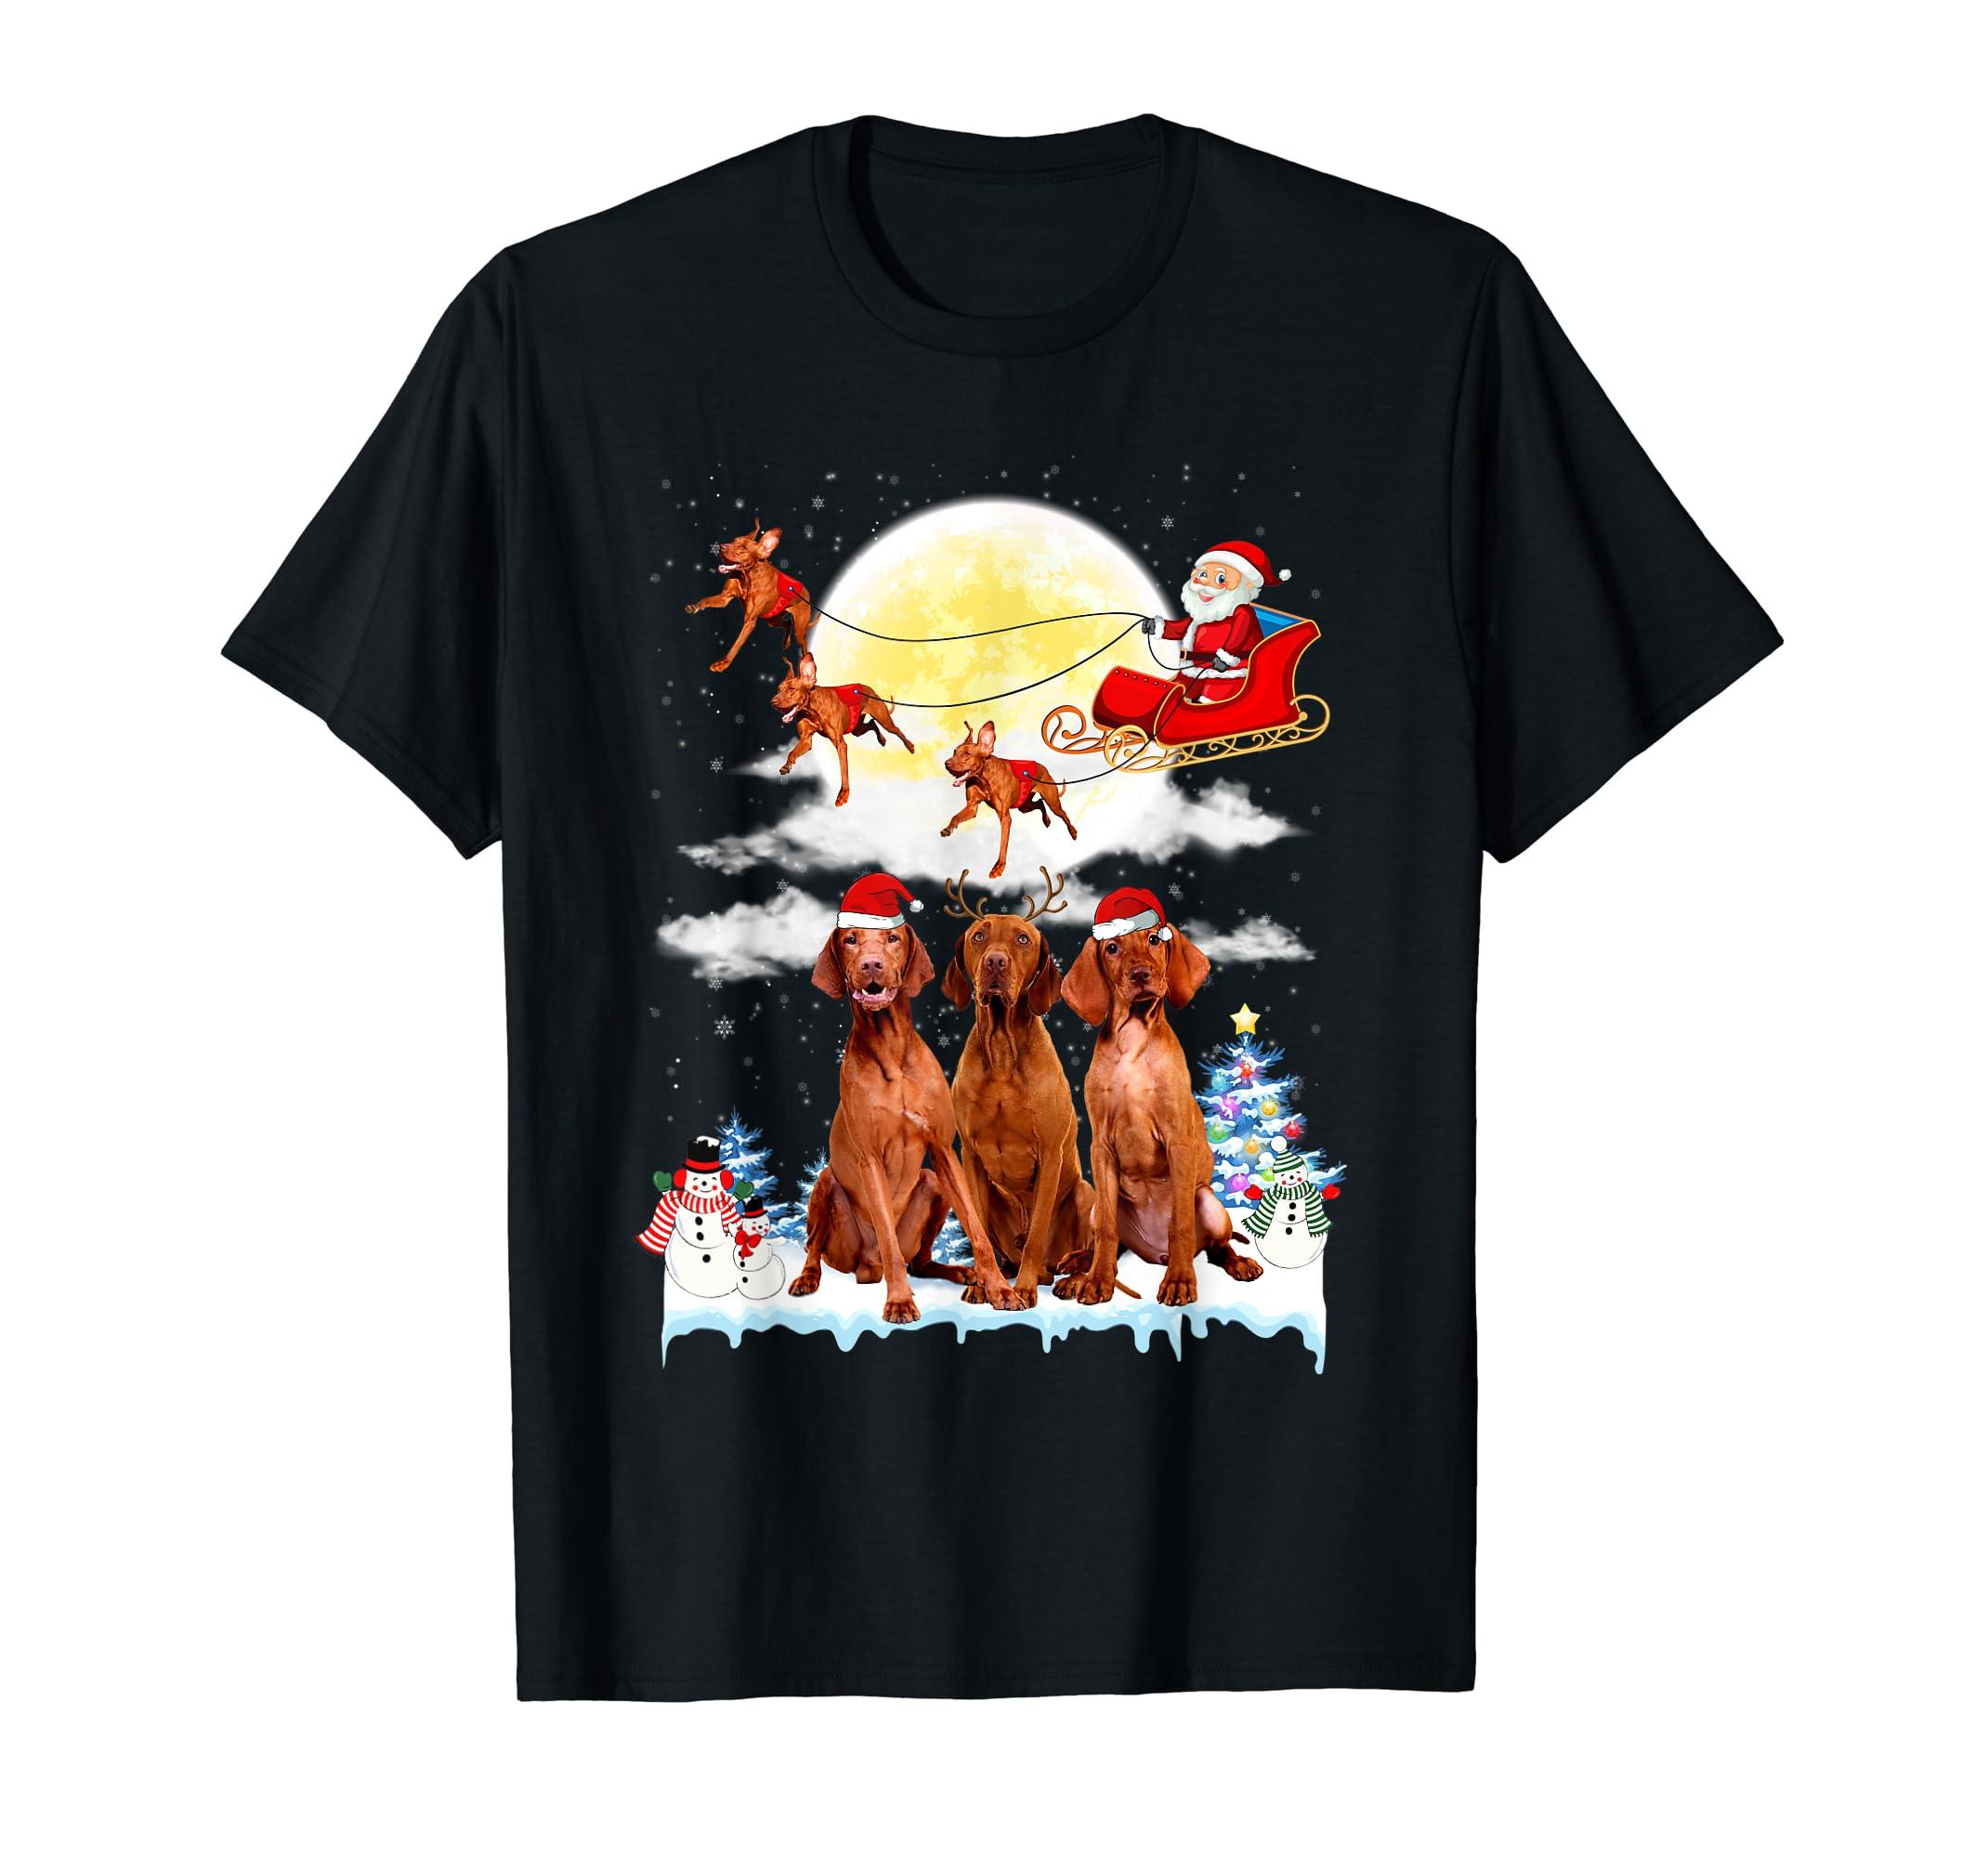 Vizsla Dog Santa Sleigh Christmas Gift T-Shirt-Men's T-Shirt-Black